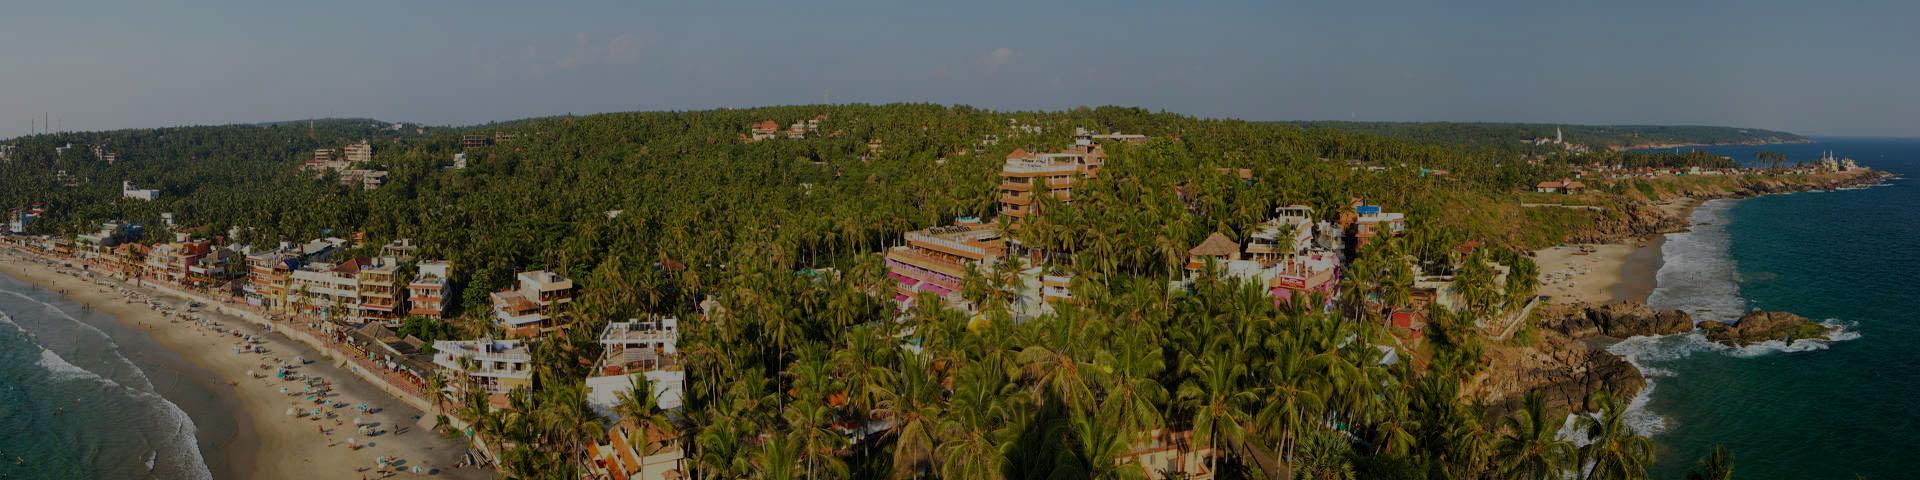 Trivandrum hero banner edit2